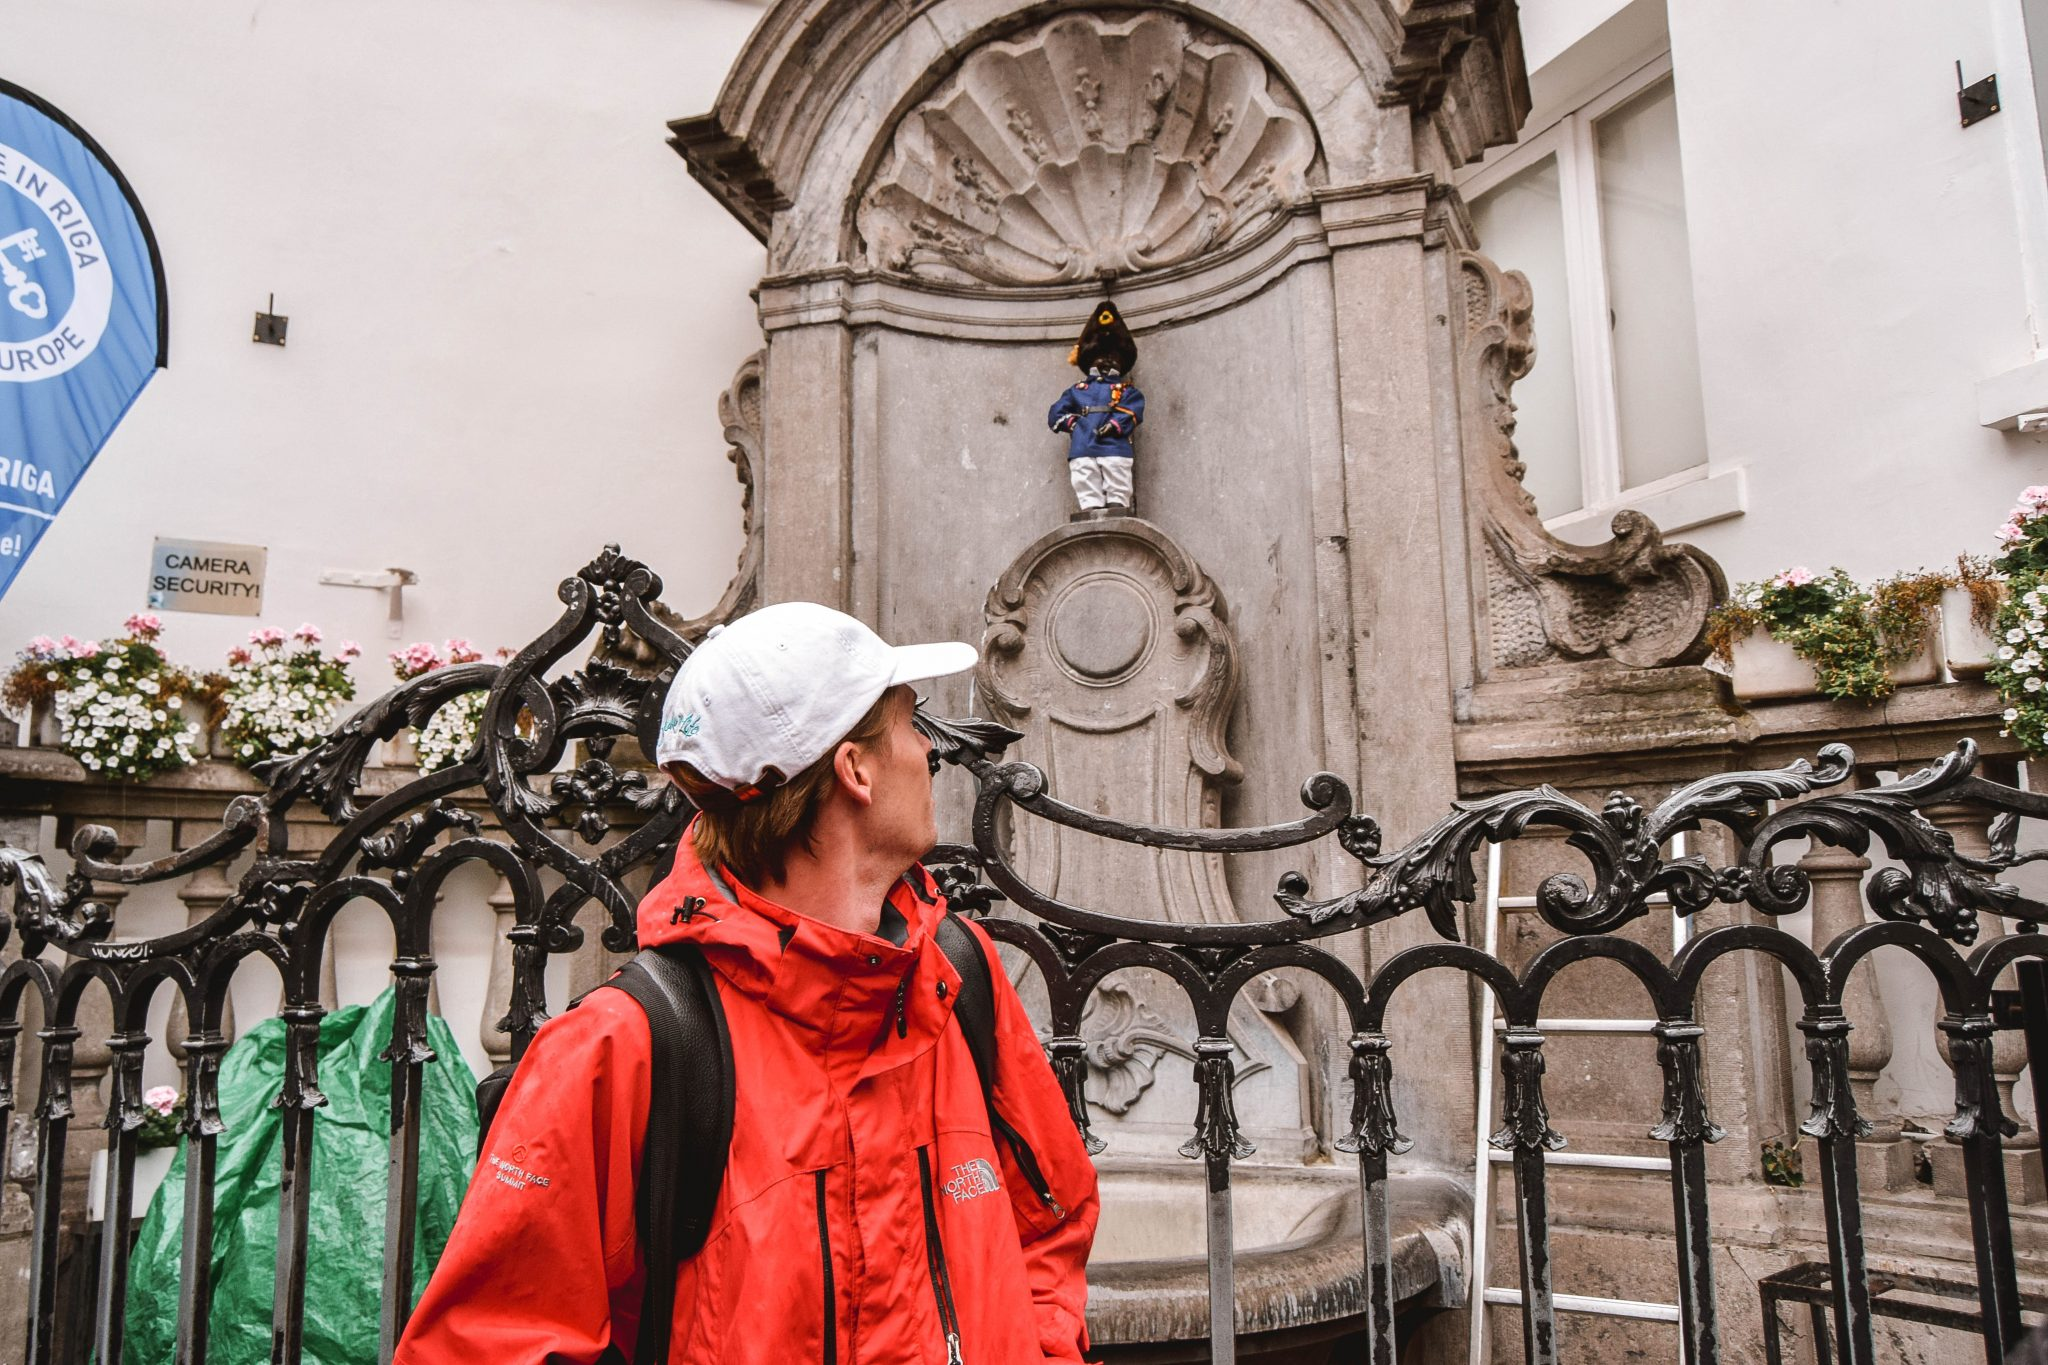 Wanderers & Warriors - Charlie & Lauren UK Travel Couple - Things To Do In Brussels In A Weekend - Manneken Pis Brussels